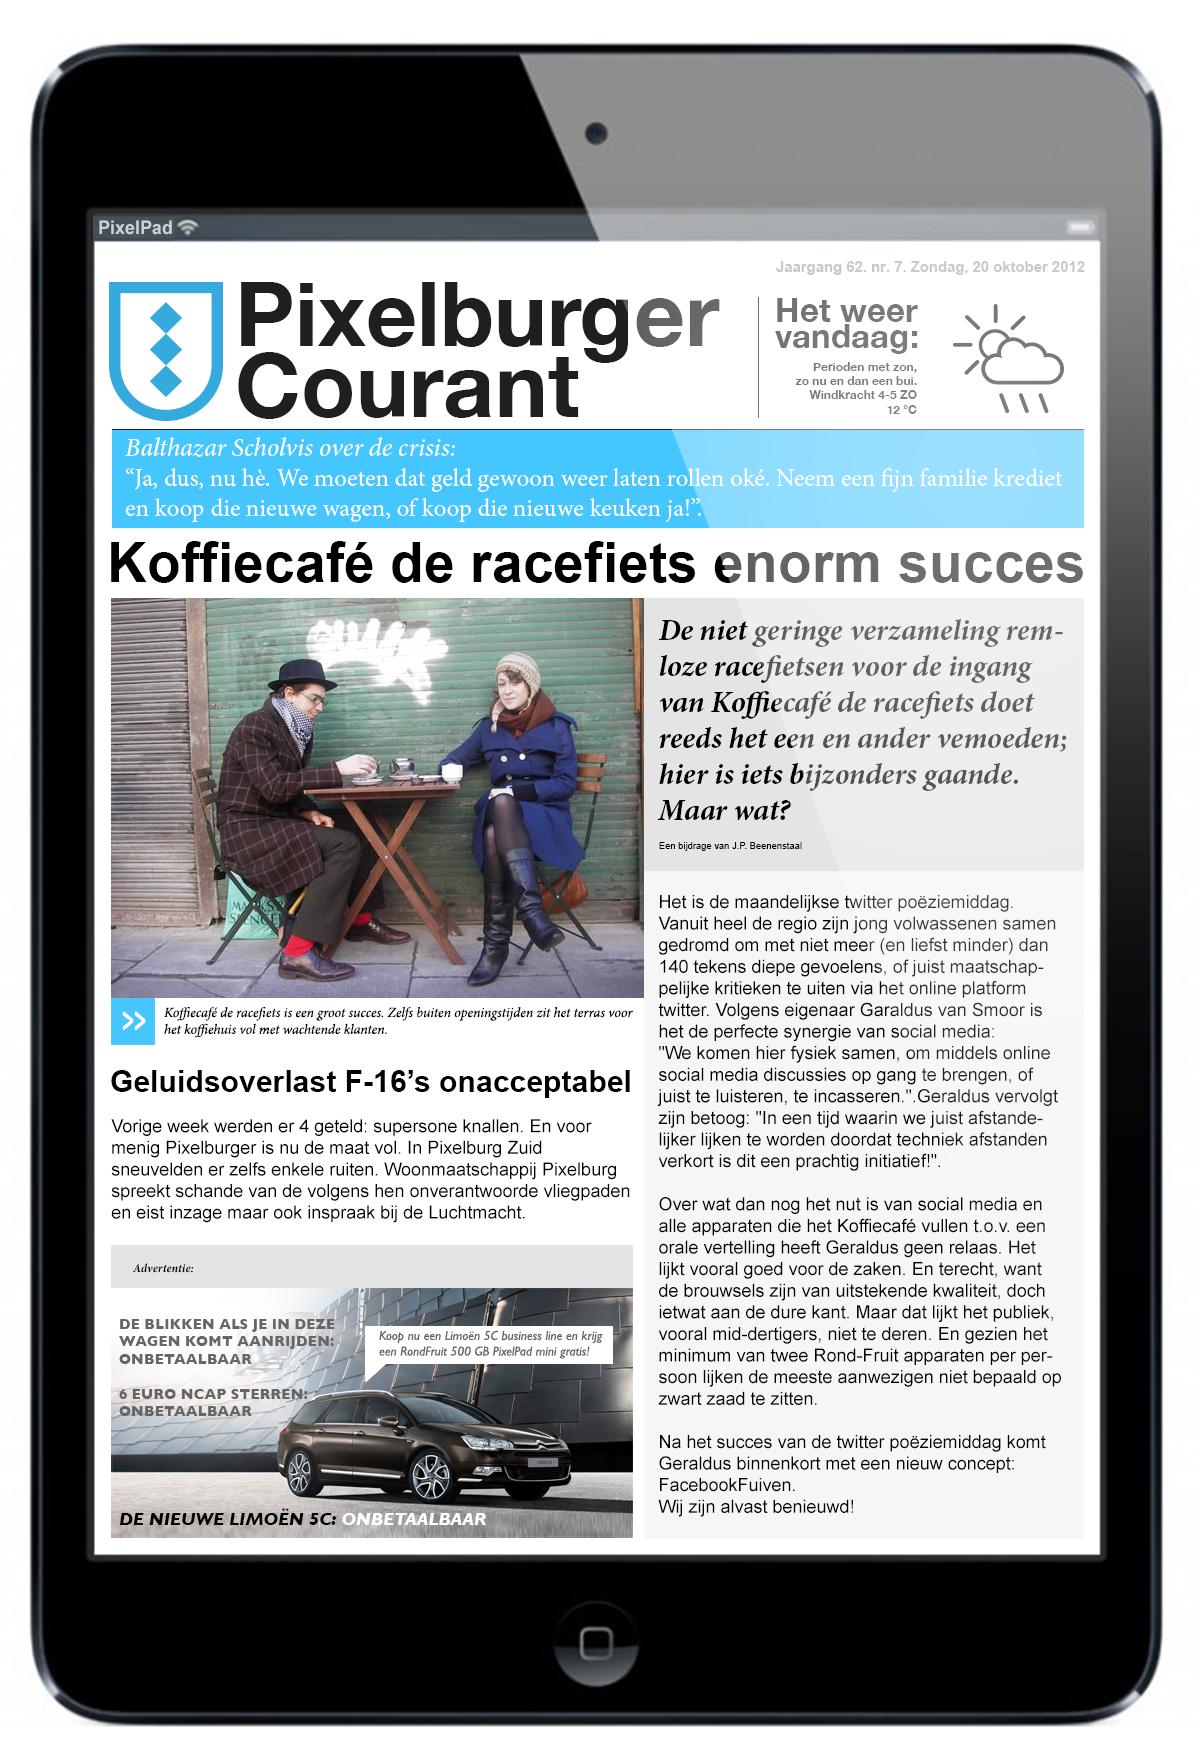 Pixelburger Courant 7